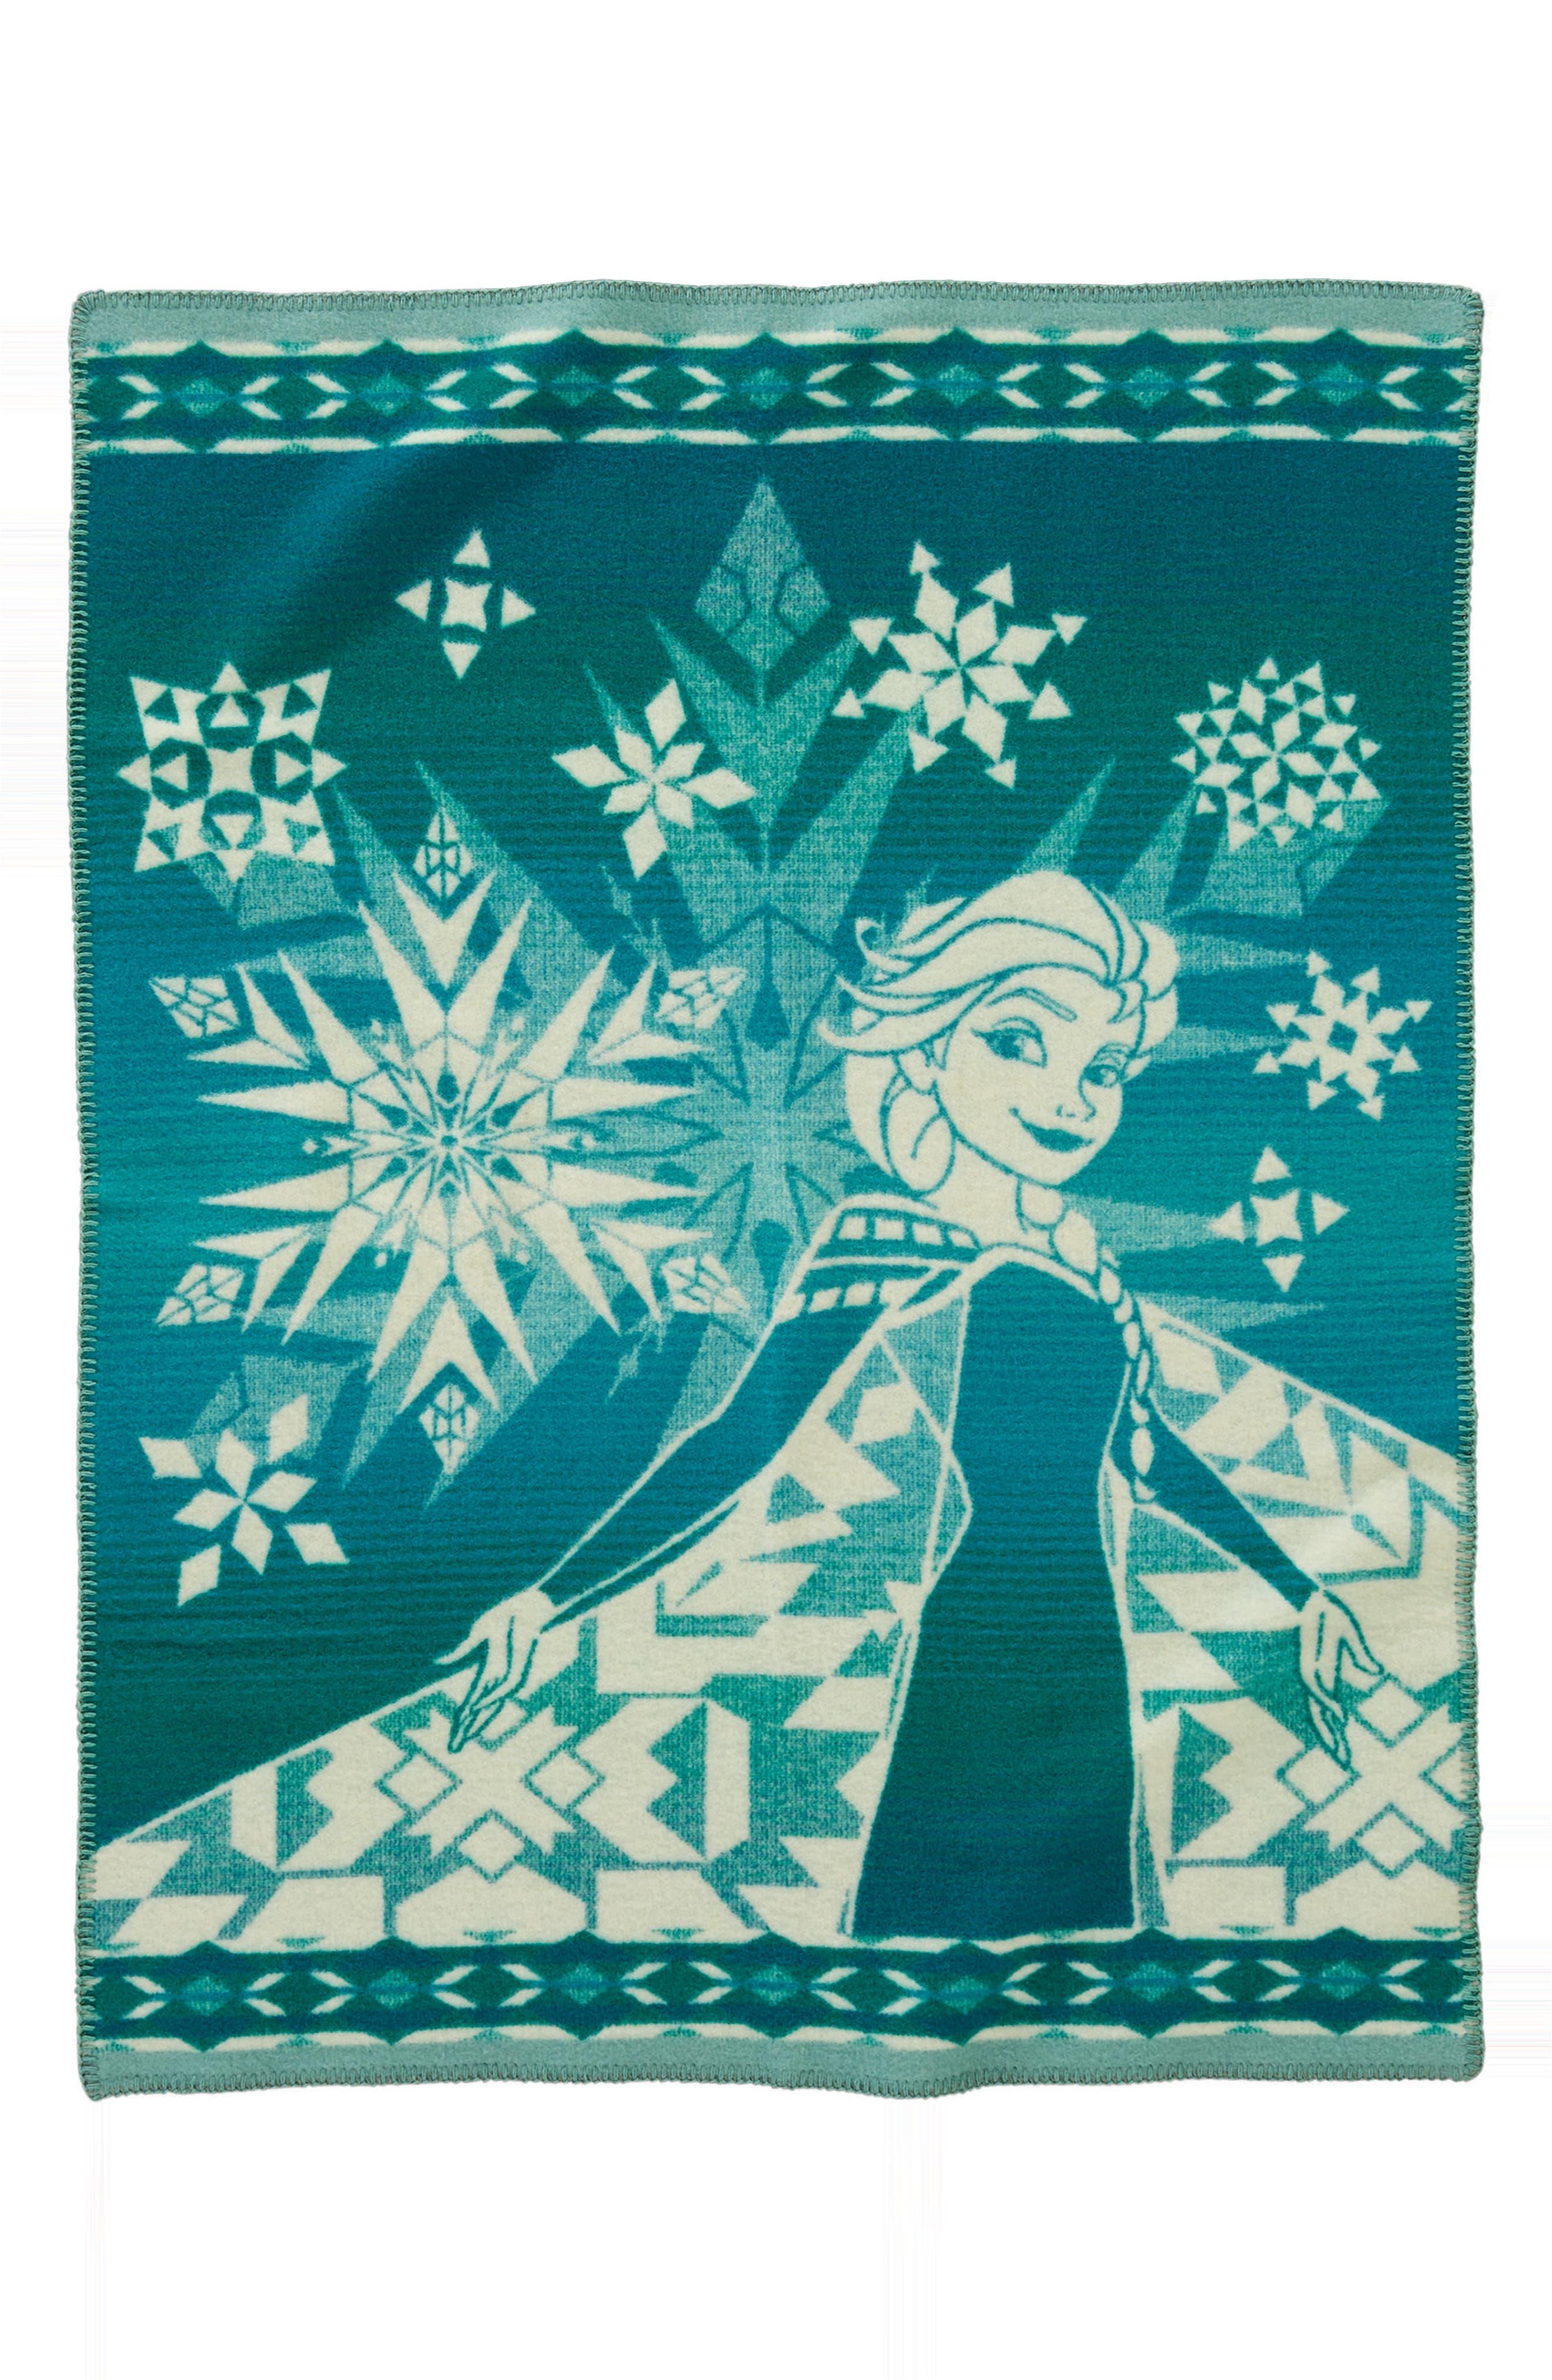 Alternate Image 1 Selected - Pendleton Elsa's Courage Blanket Throw